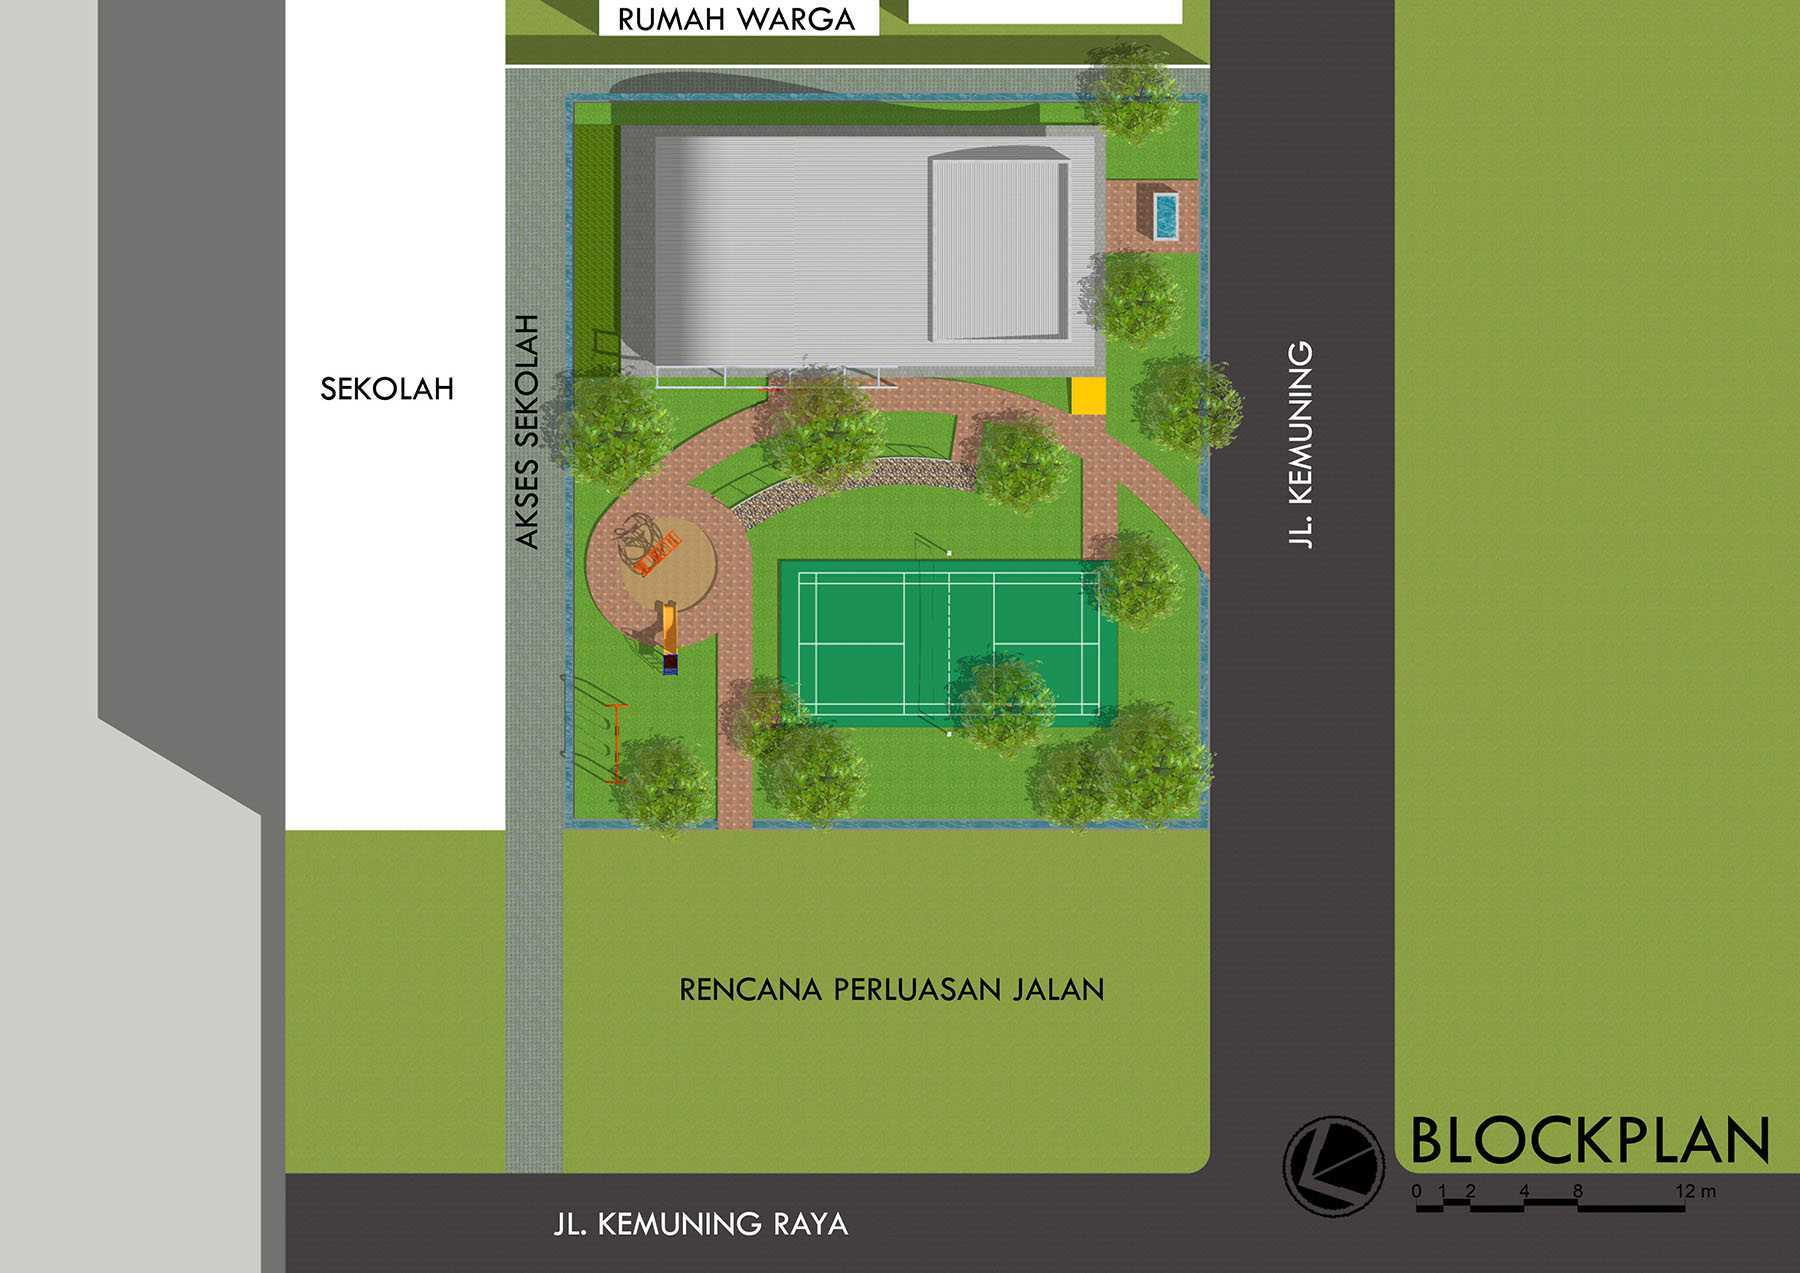 Monokroma Architect Rptra Kemuning Jakarta, Indonesia Jakarta, Indonesia 5-Block-Plan Minimalis  24675